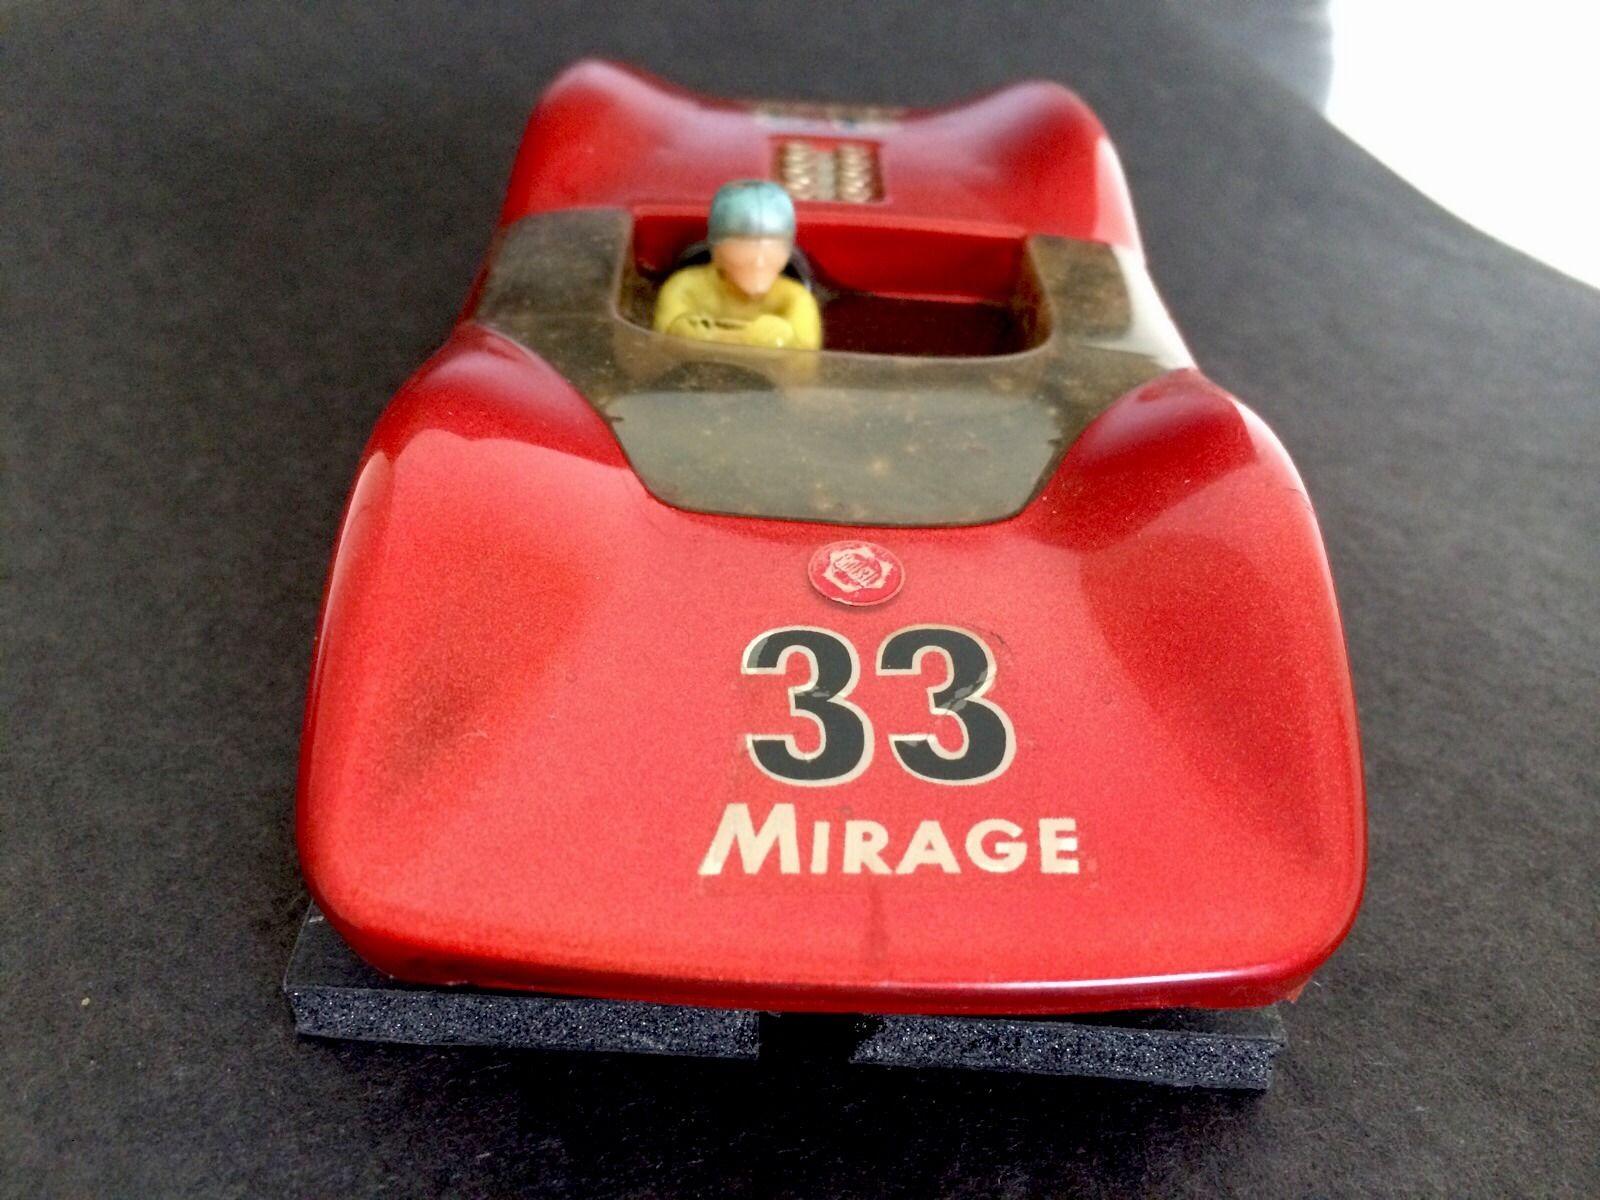 testor's mirage.JPG